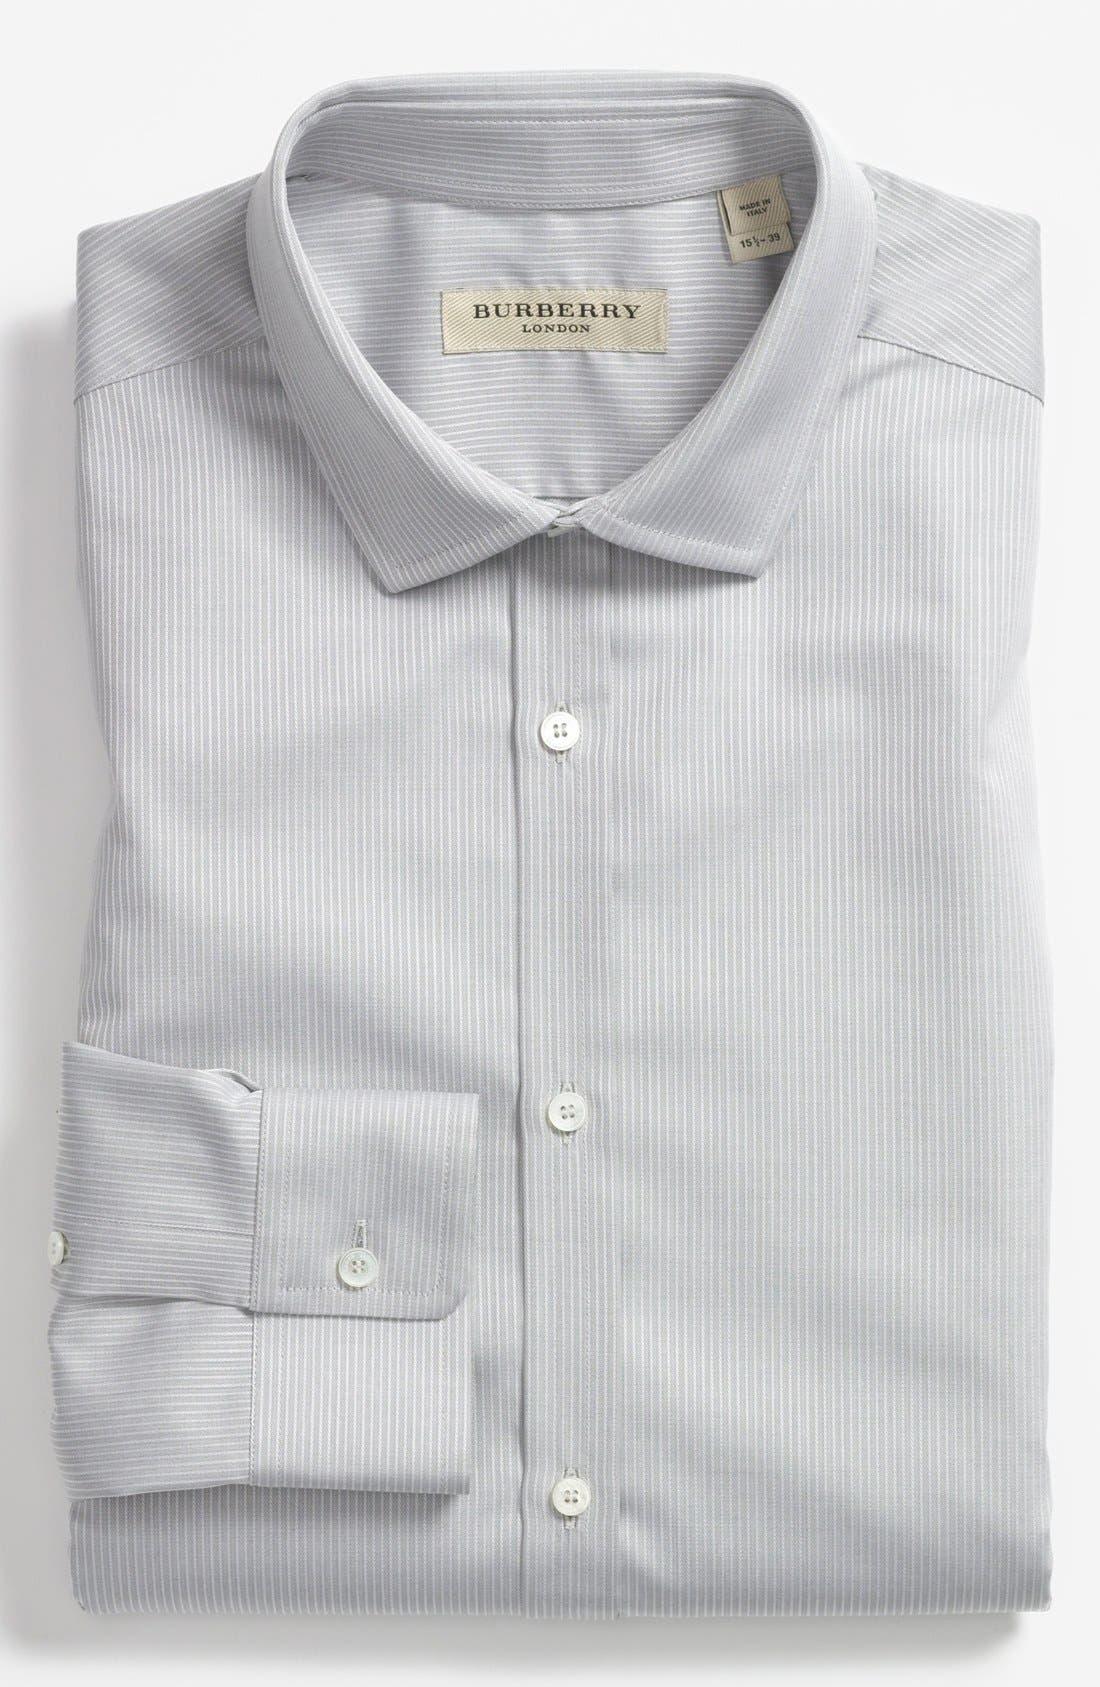 Main Image - Burberry London Stripe Tailored Fit Dress Shirt